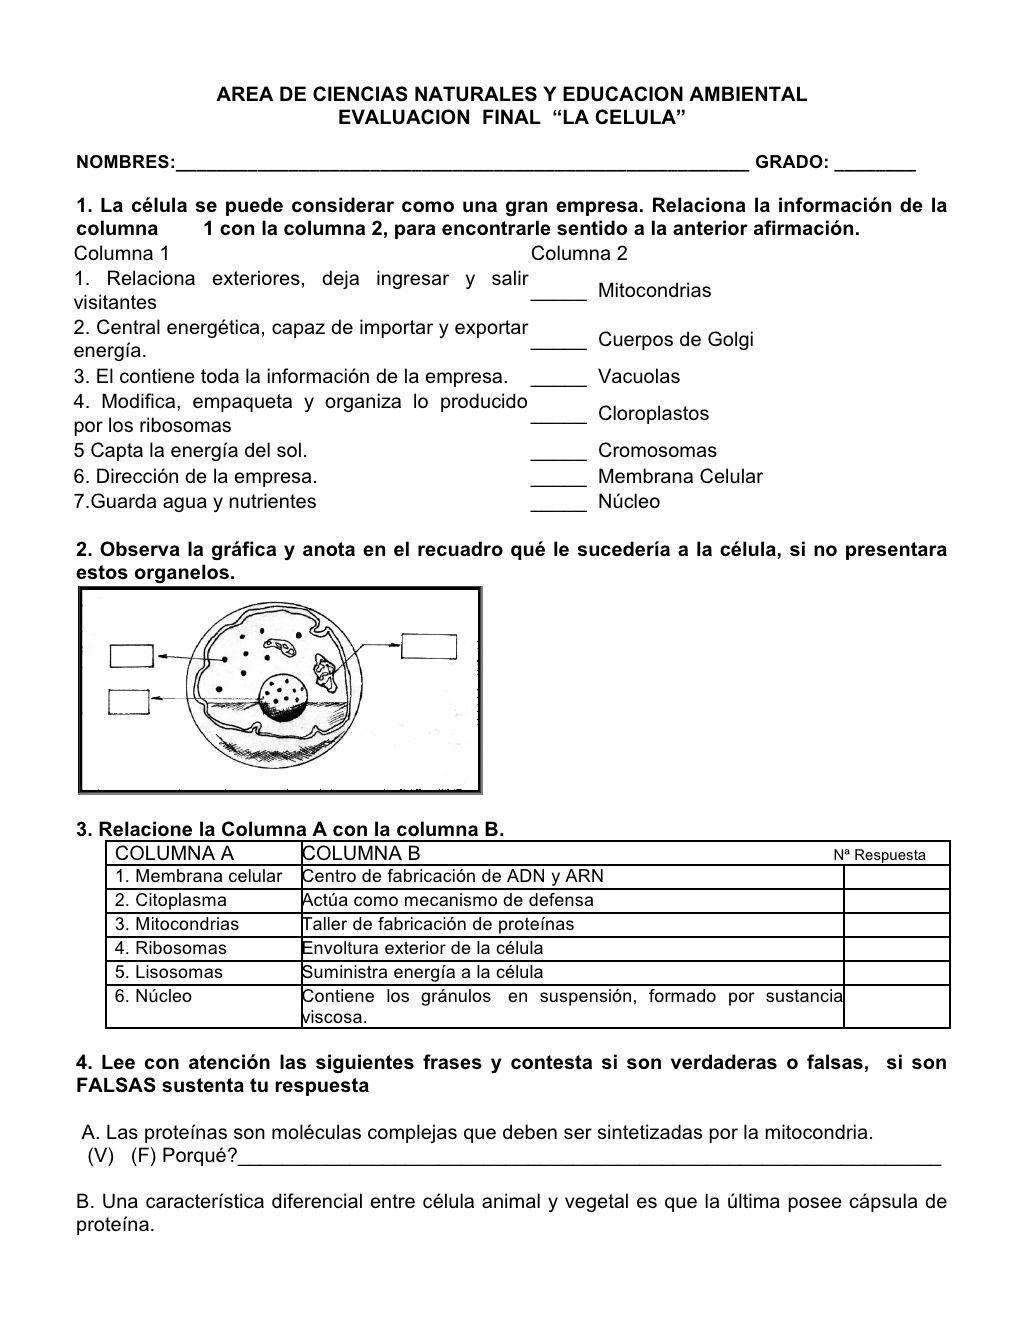 Evaluacion 1 La Celula By Carlos Aguiar Via Slideshare